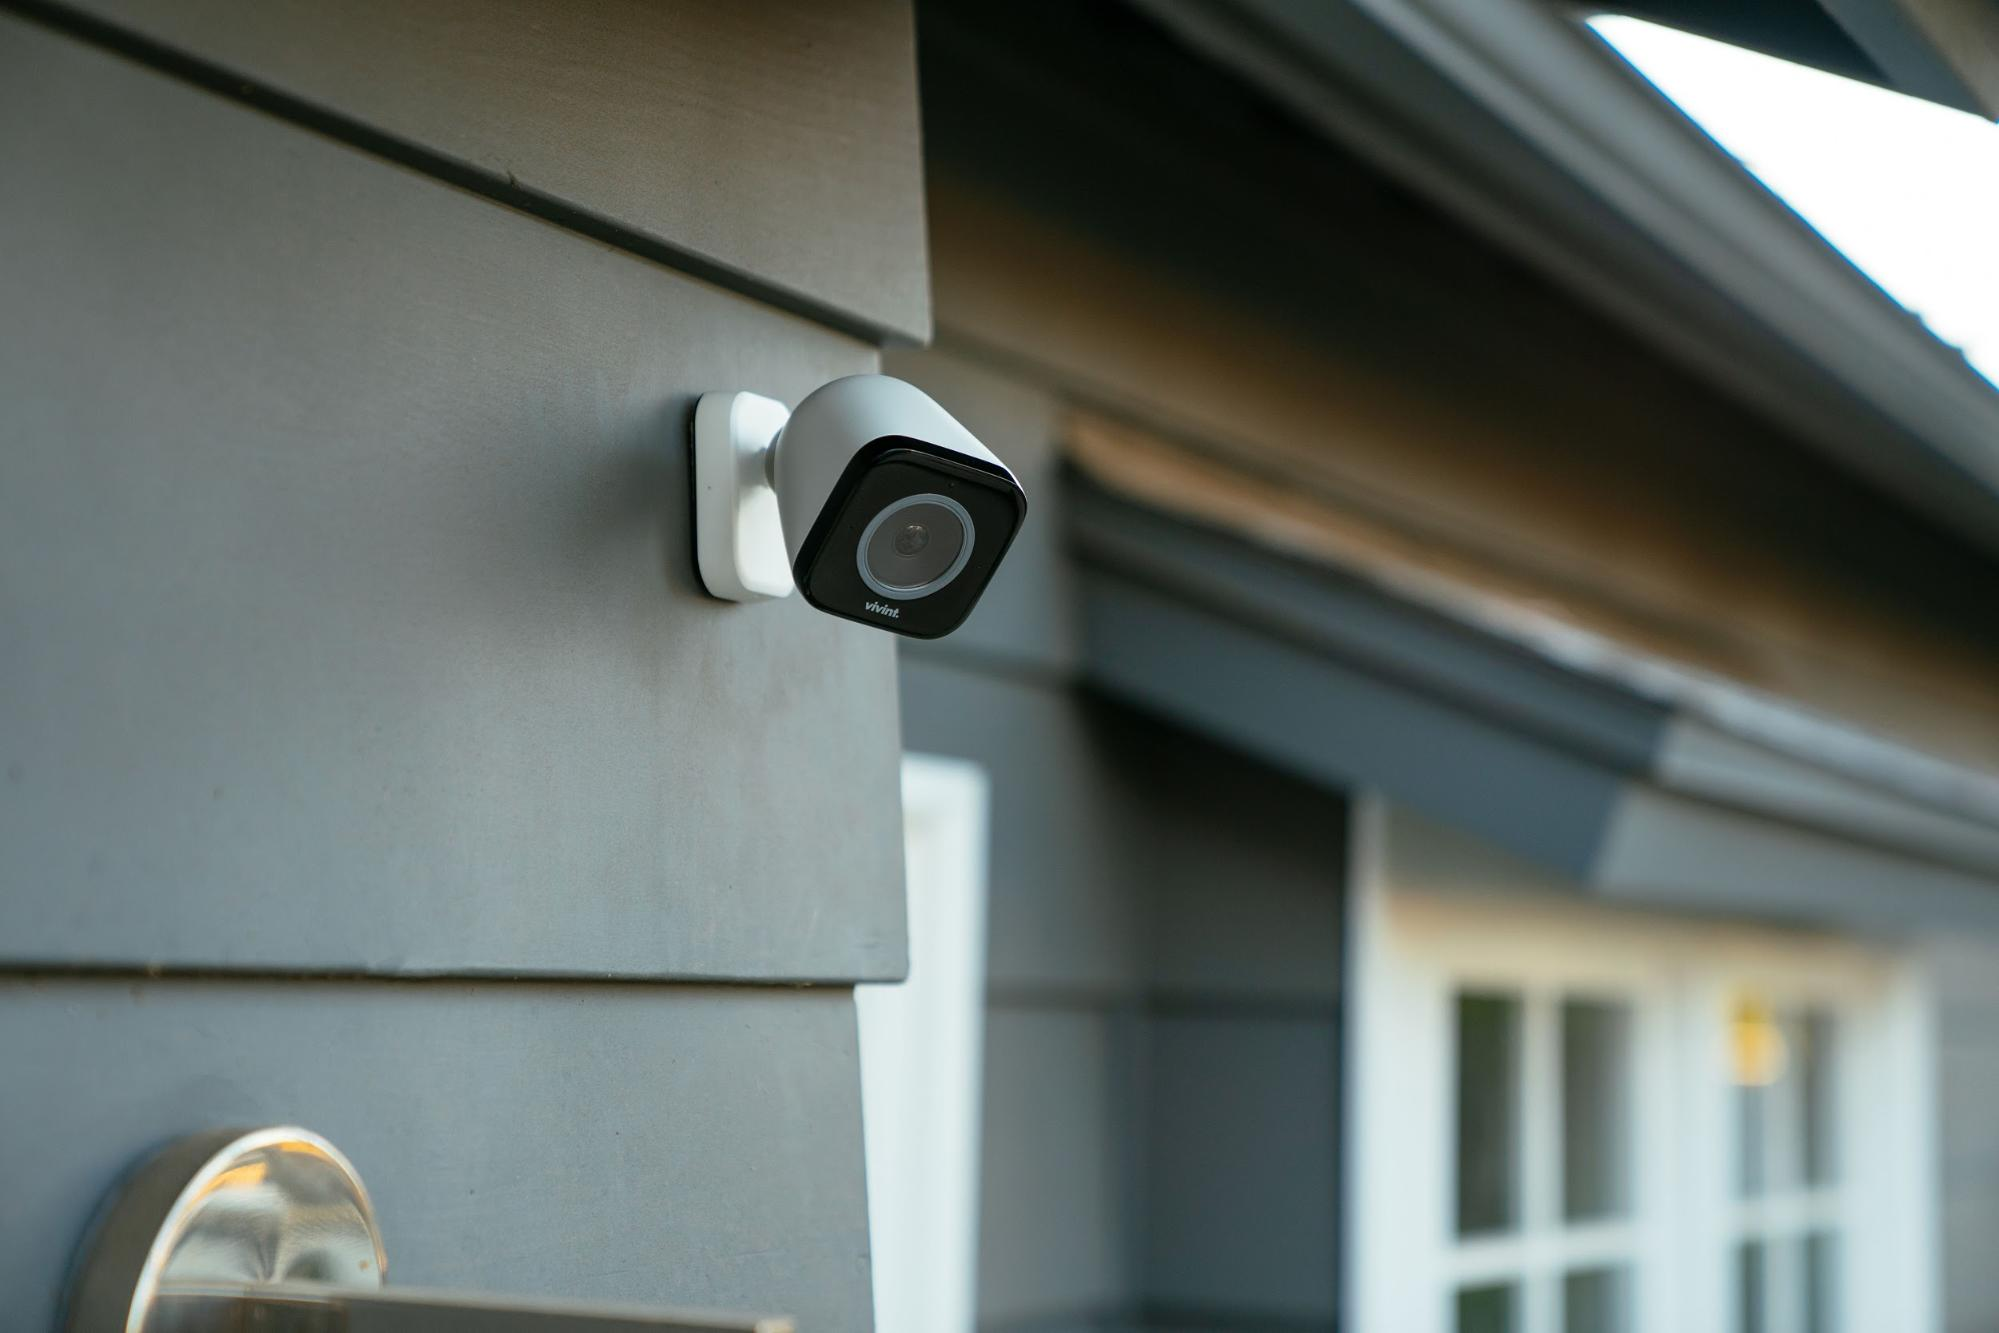 Vivint Home Security Review 2019: Does Vivint Have the Best